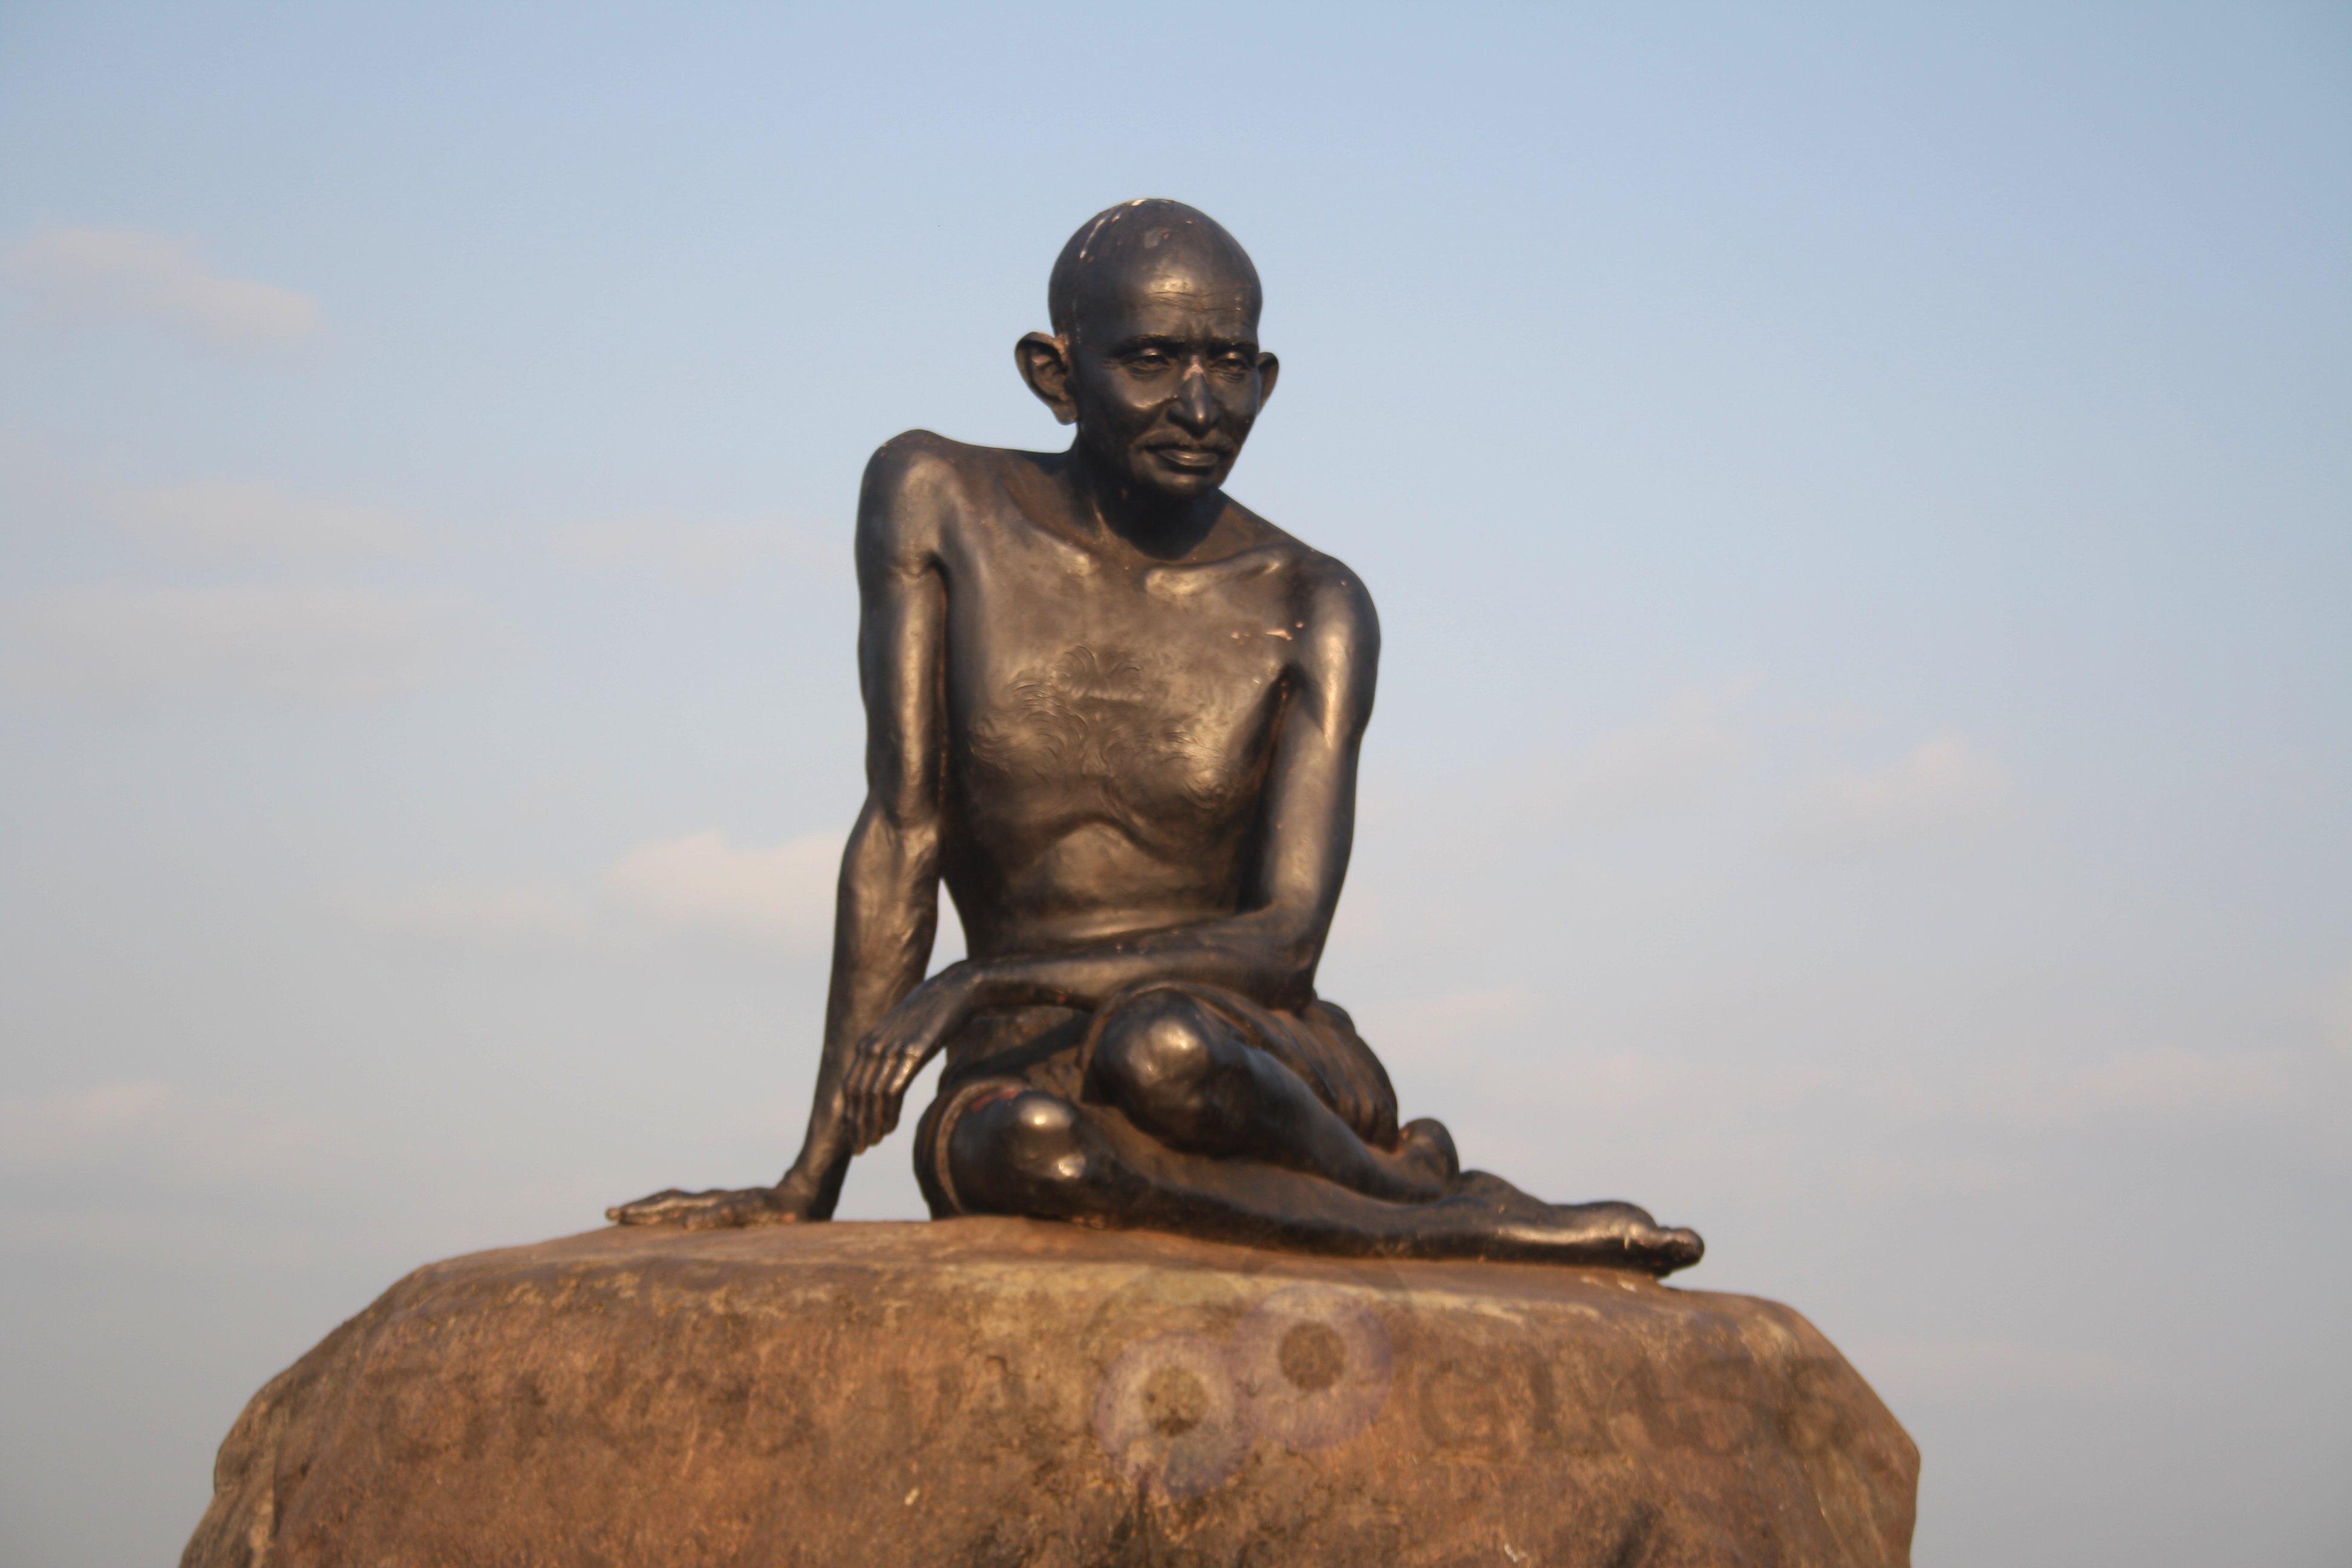 P,personality,Mahatma Gandhi, Father of the nation,a-z,pravin,pm,phenomenon,throo da looking glass,bangalore,malpe beach,udupi,karnataka,freedom,fight,dignity